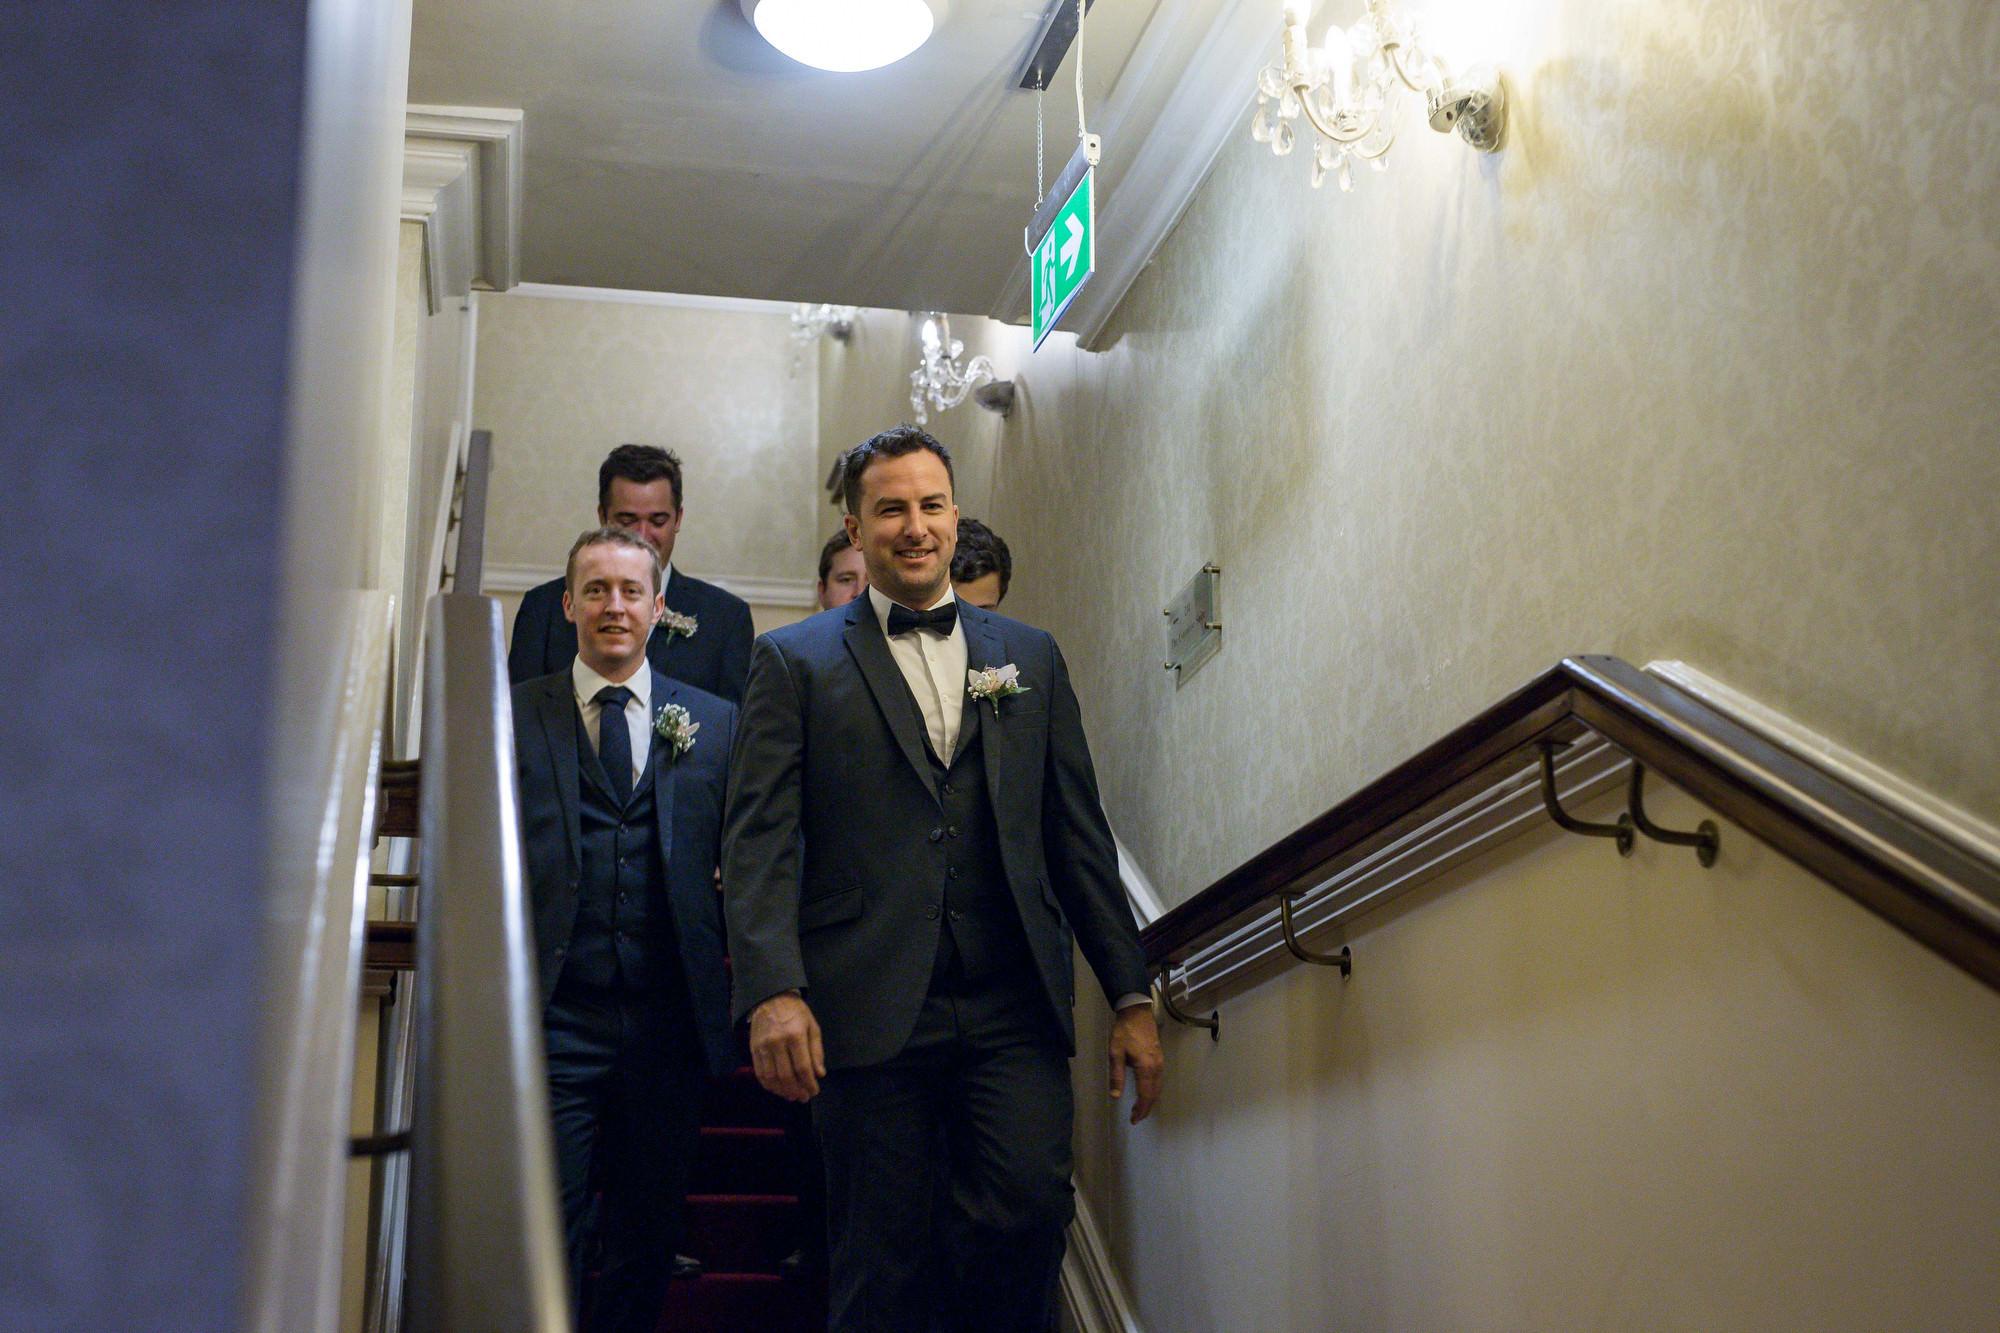 muckross_park_hotel_grougane_barra_wedding_photographer_goldenmoments_017.jpg